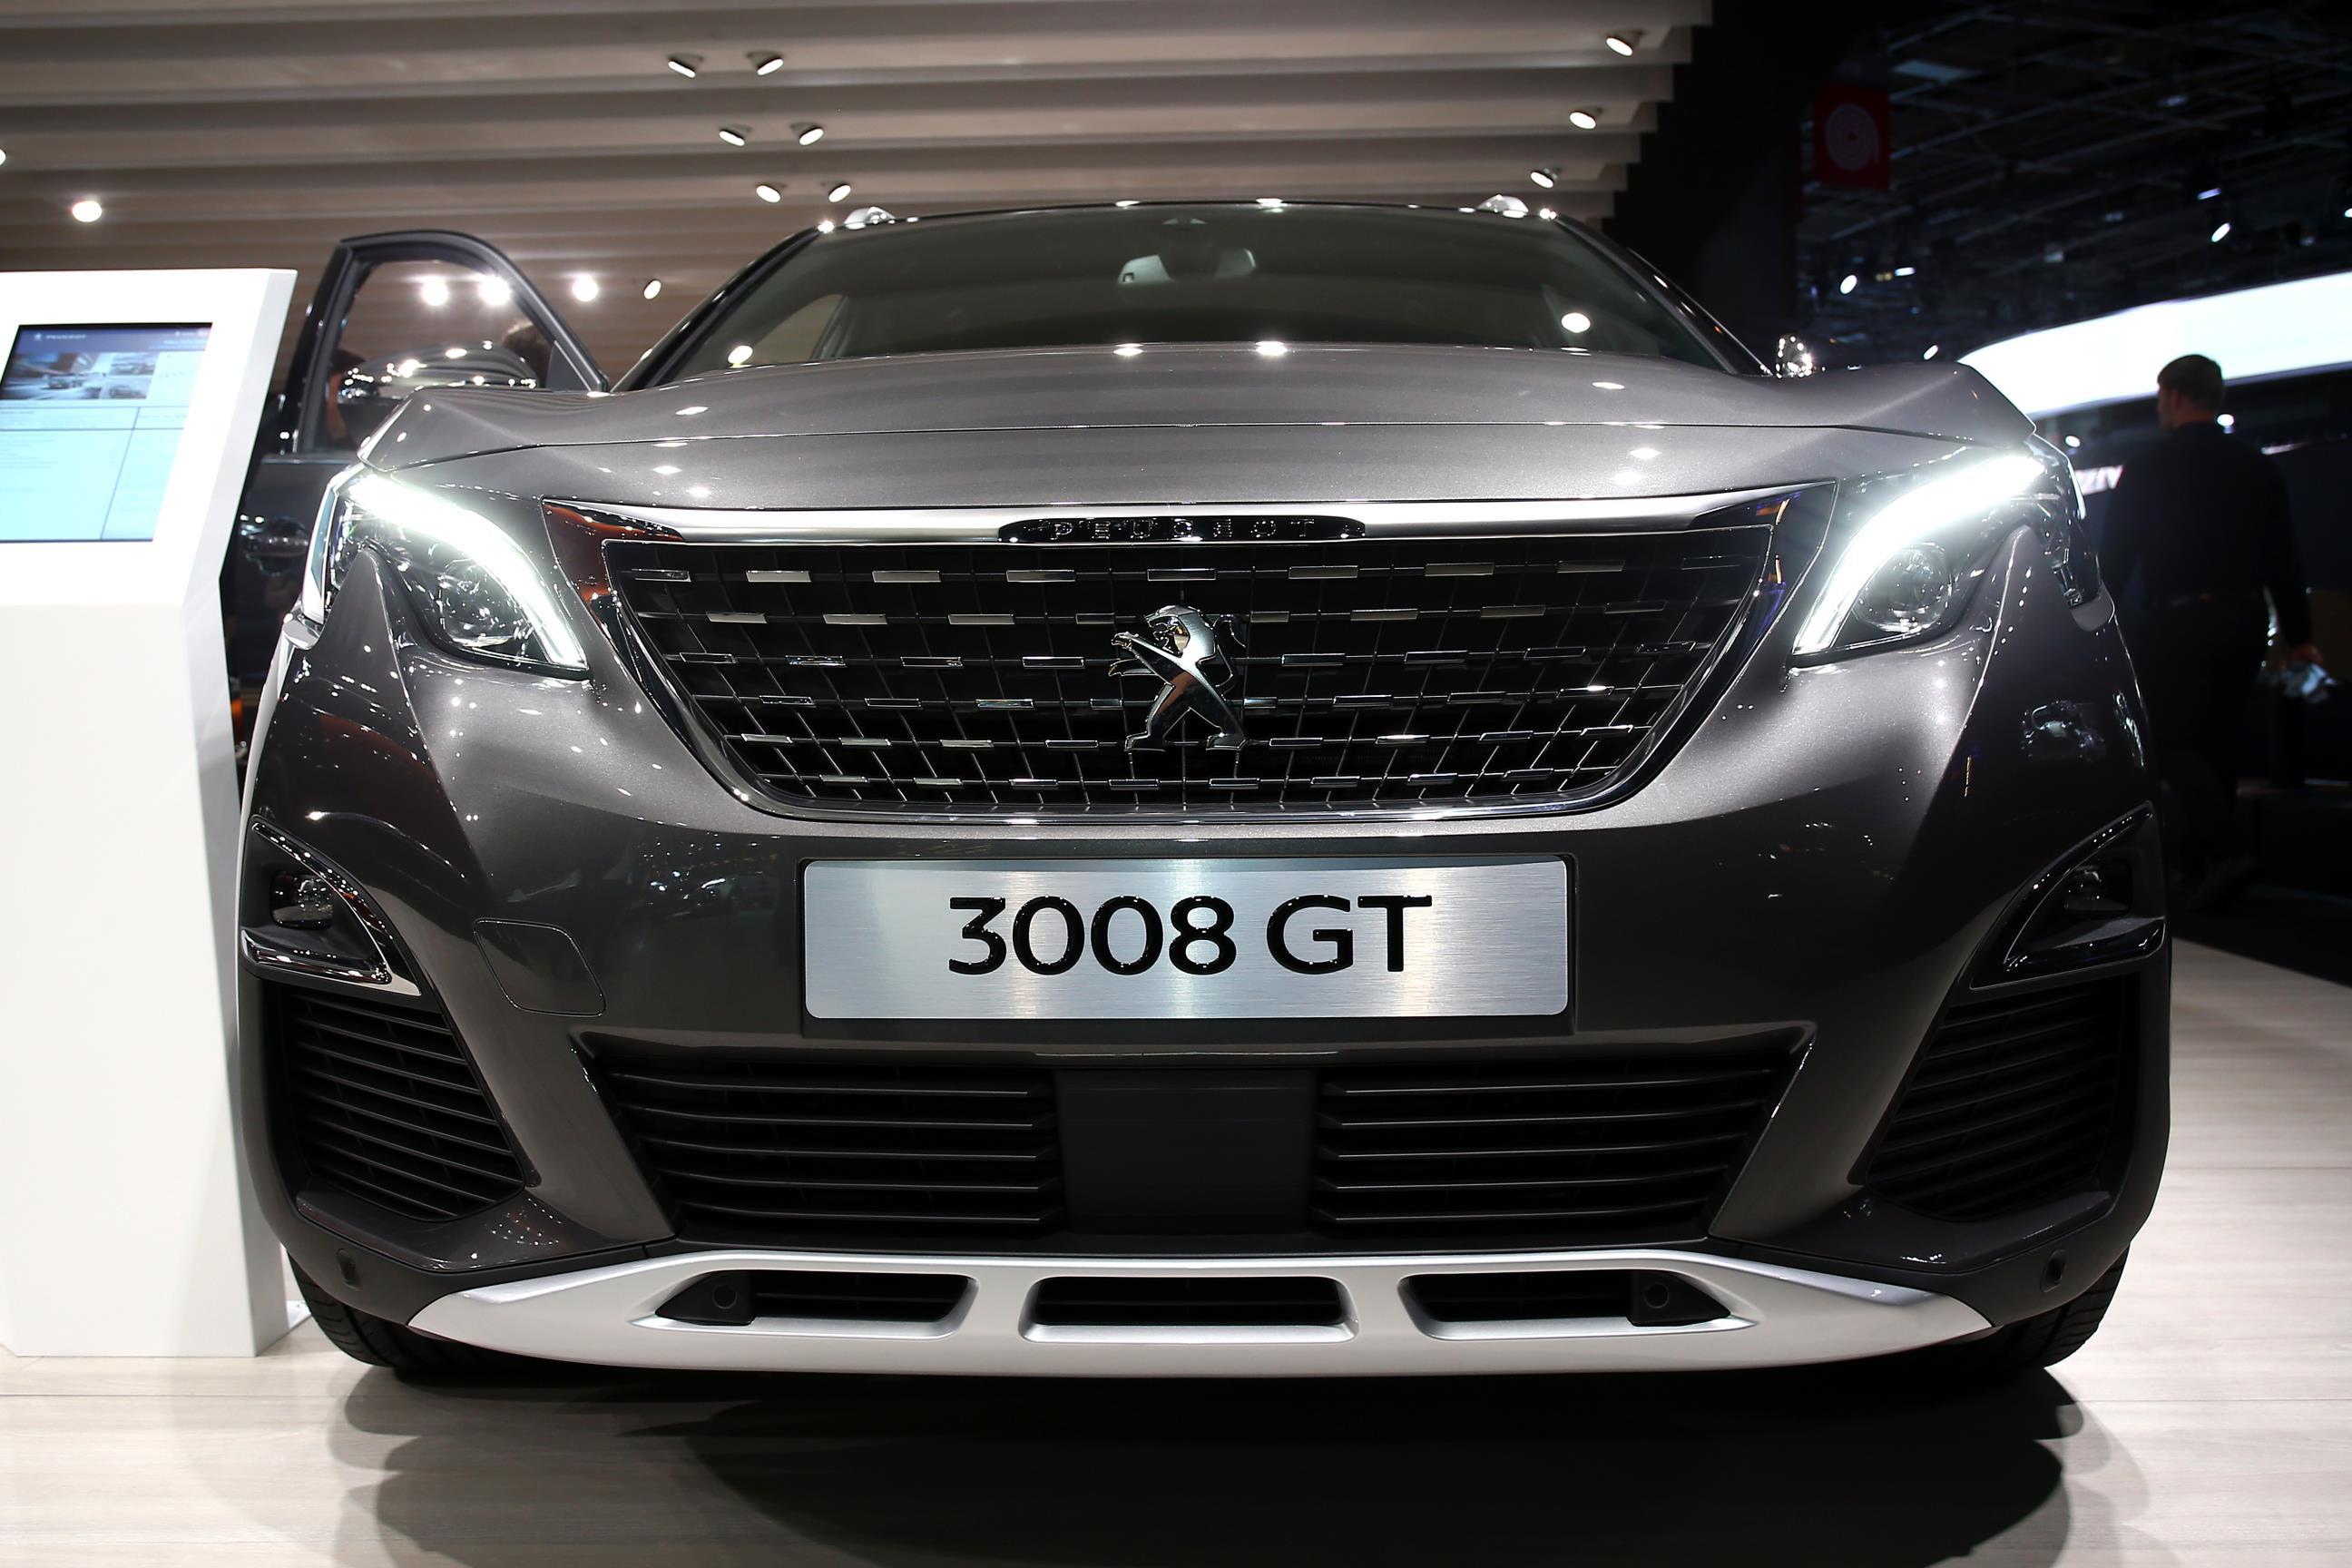 Peugeot 3008 Gt Combines Concept Interior With Hot Hatch Engine Autoevolution